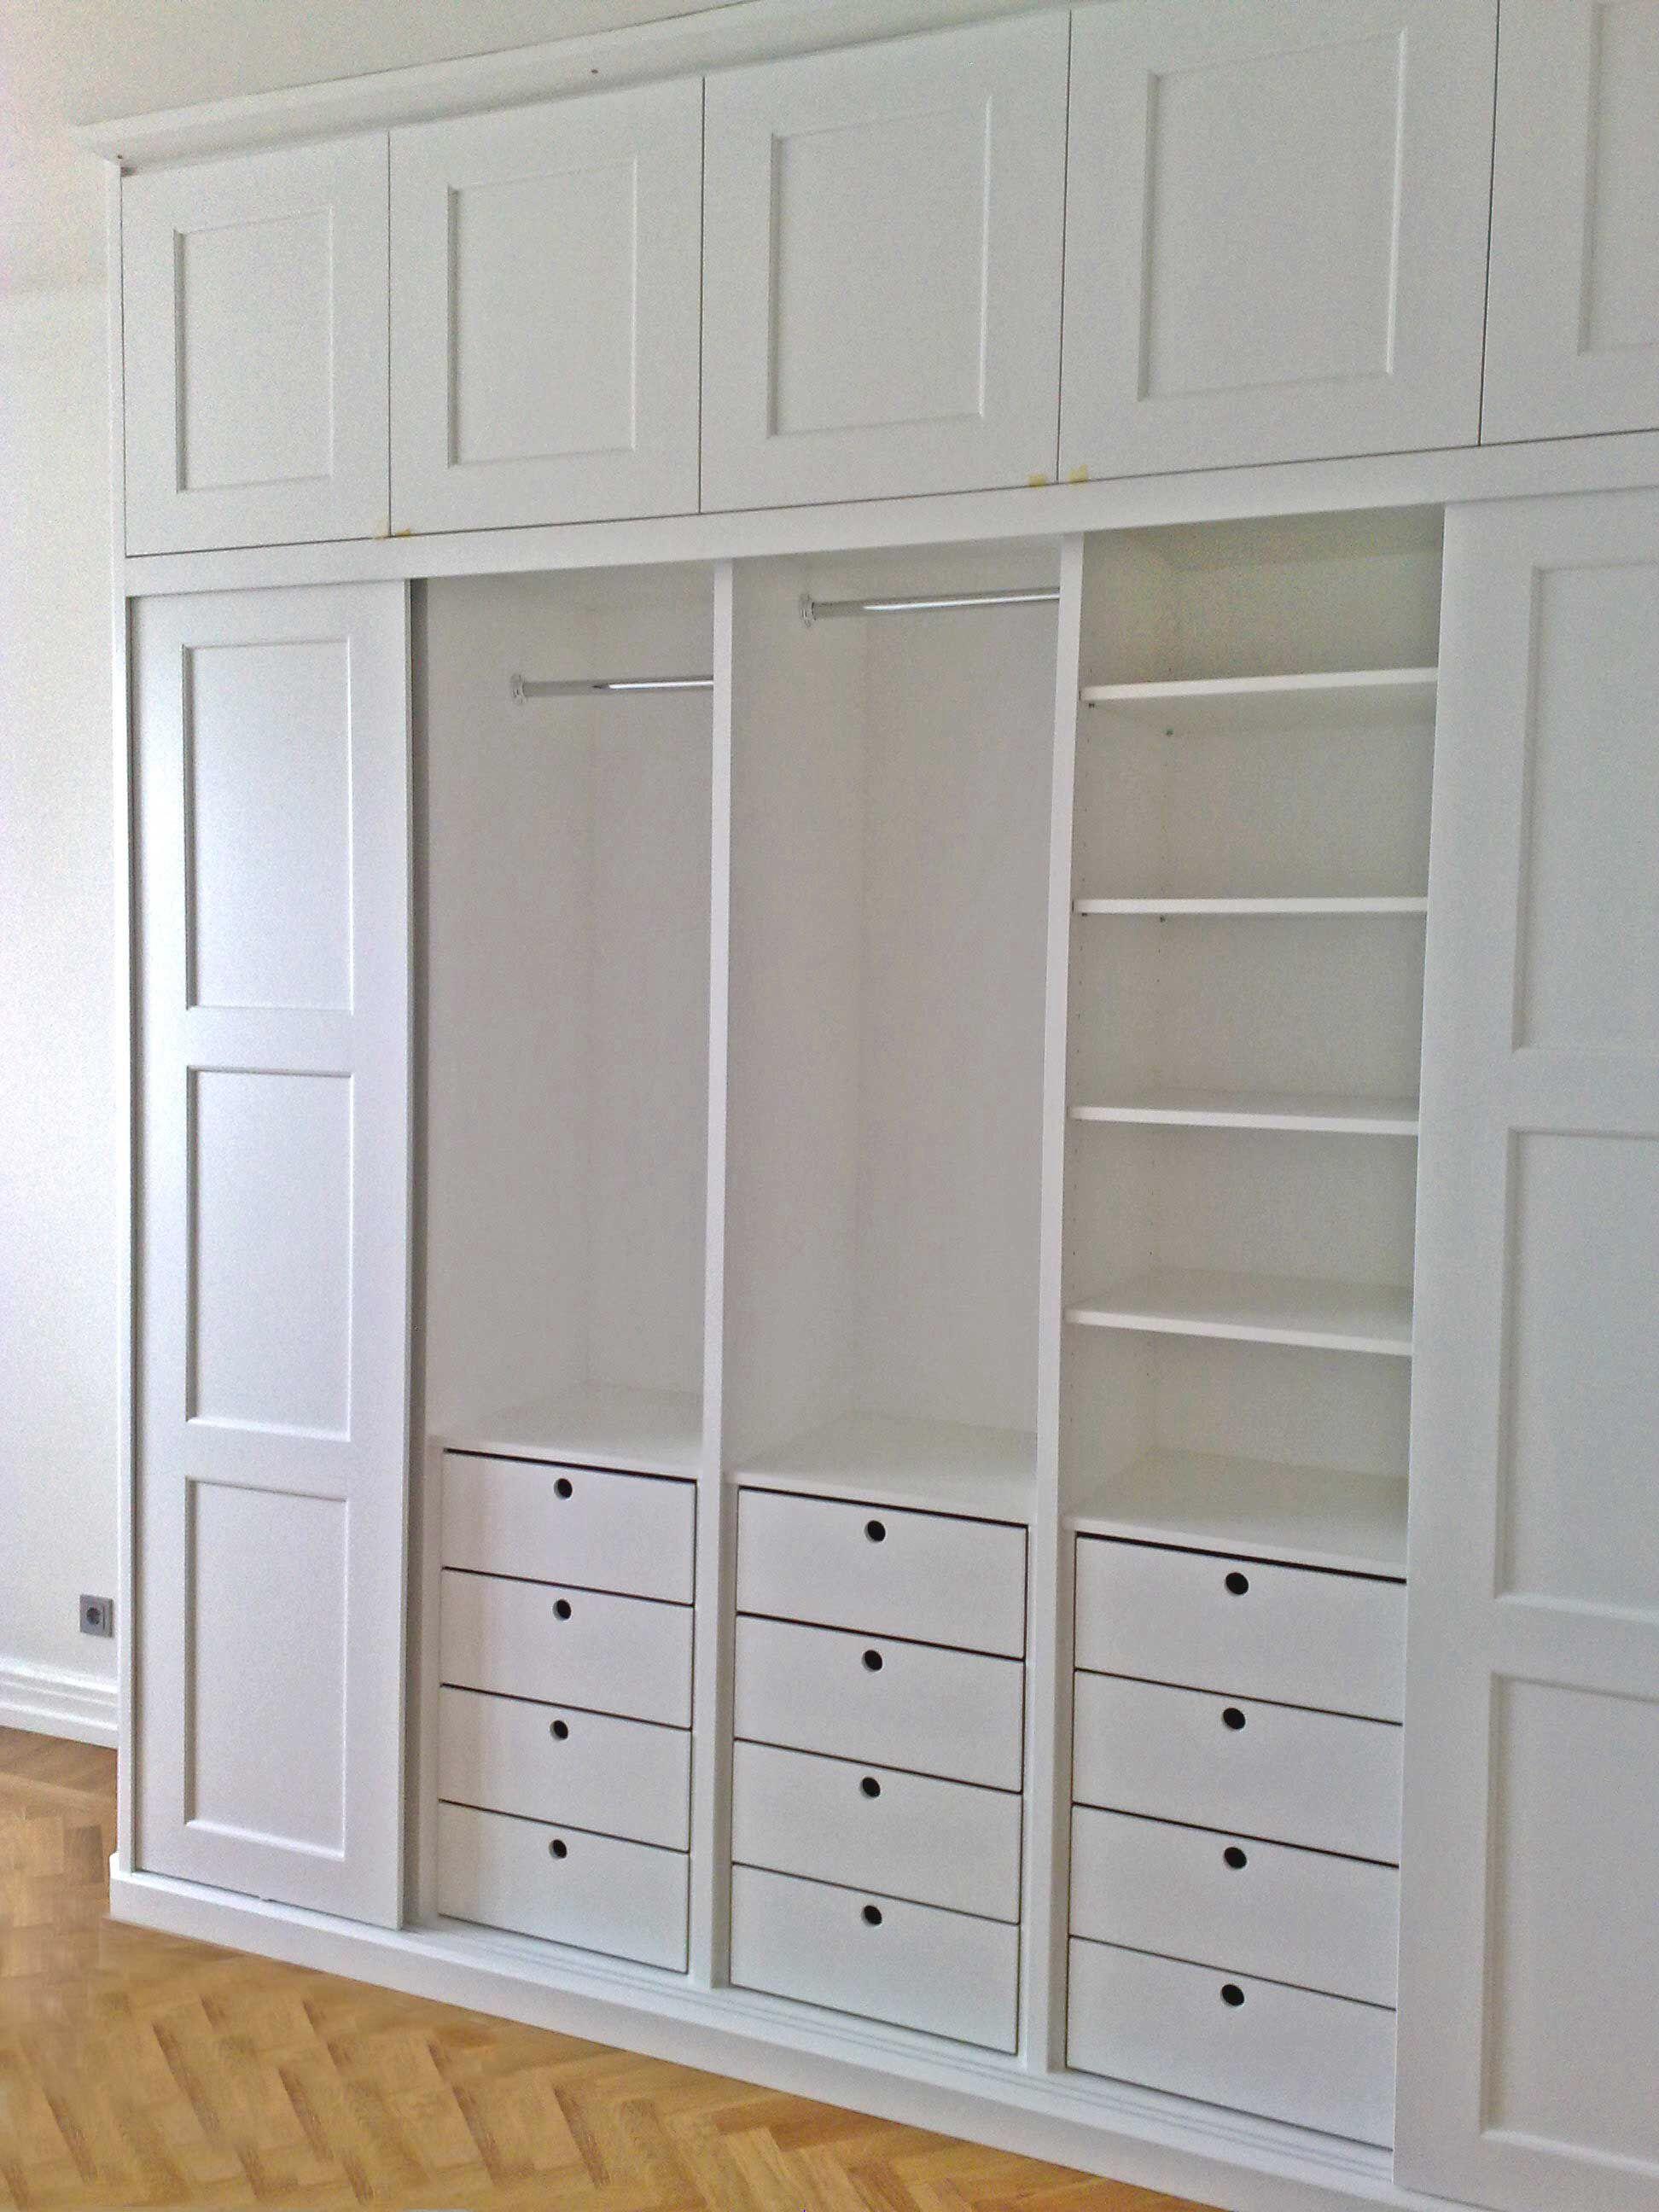 Closet Organization Ideas Diy Cubbies